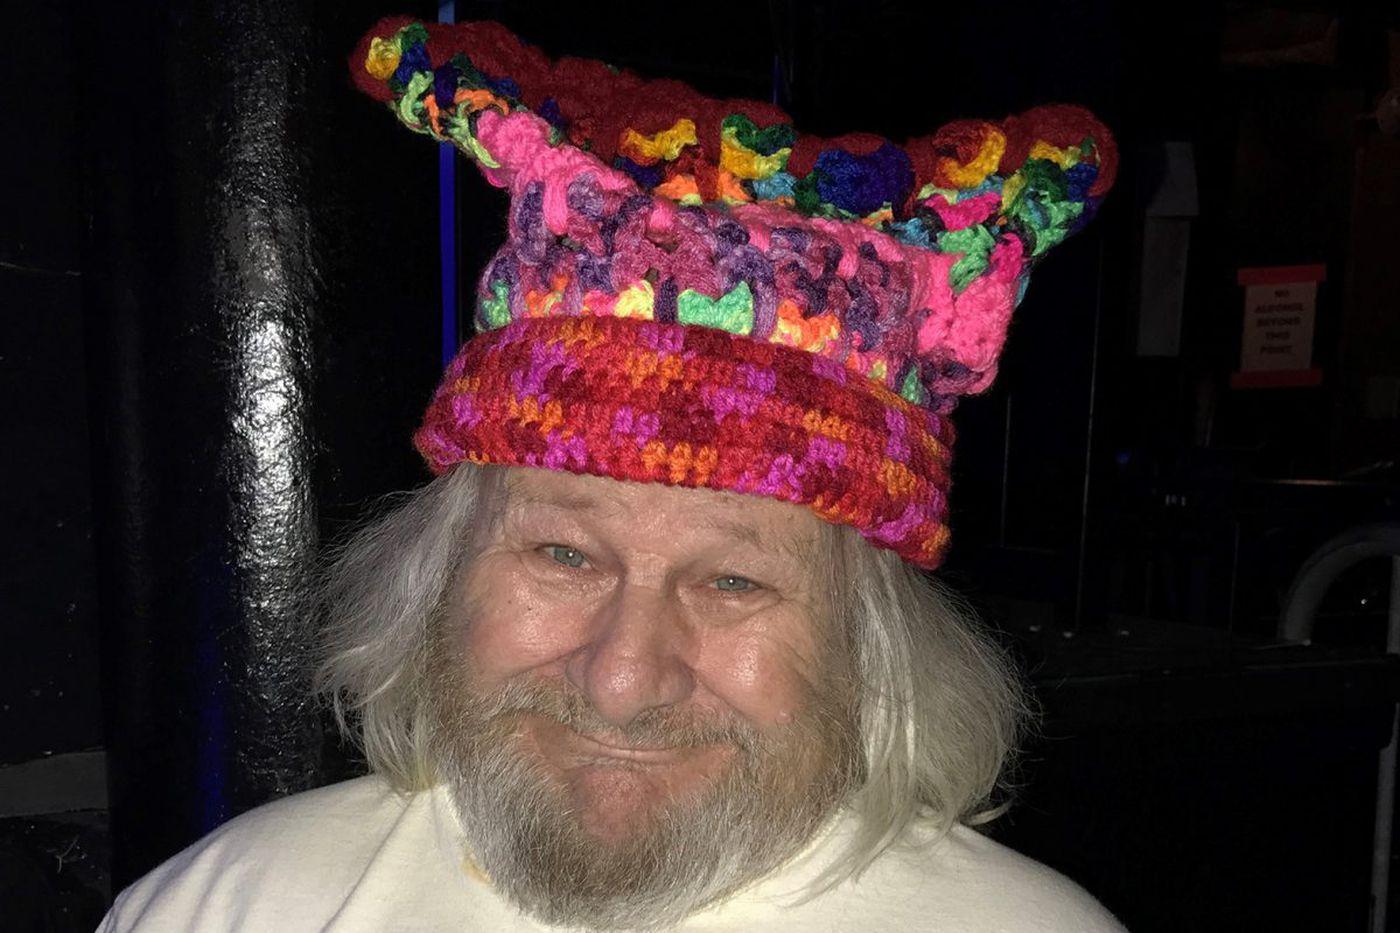 The activist/artist/clown Wavy Gravy heads to Ardmore for his birthday celebration